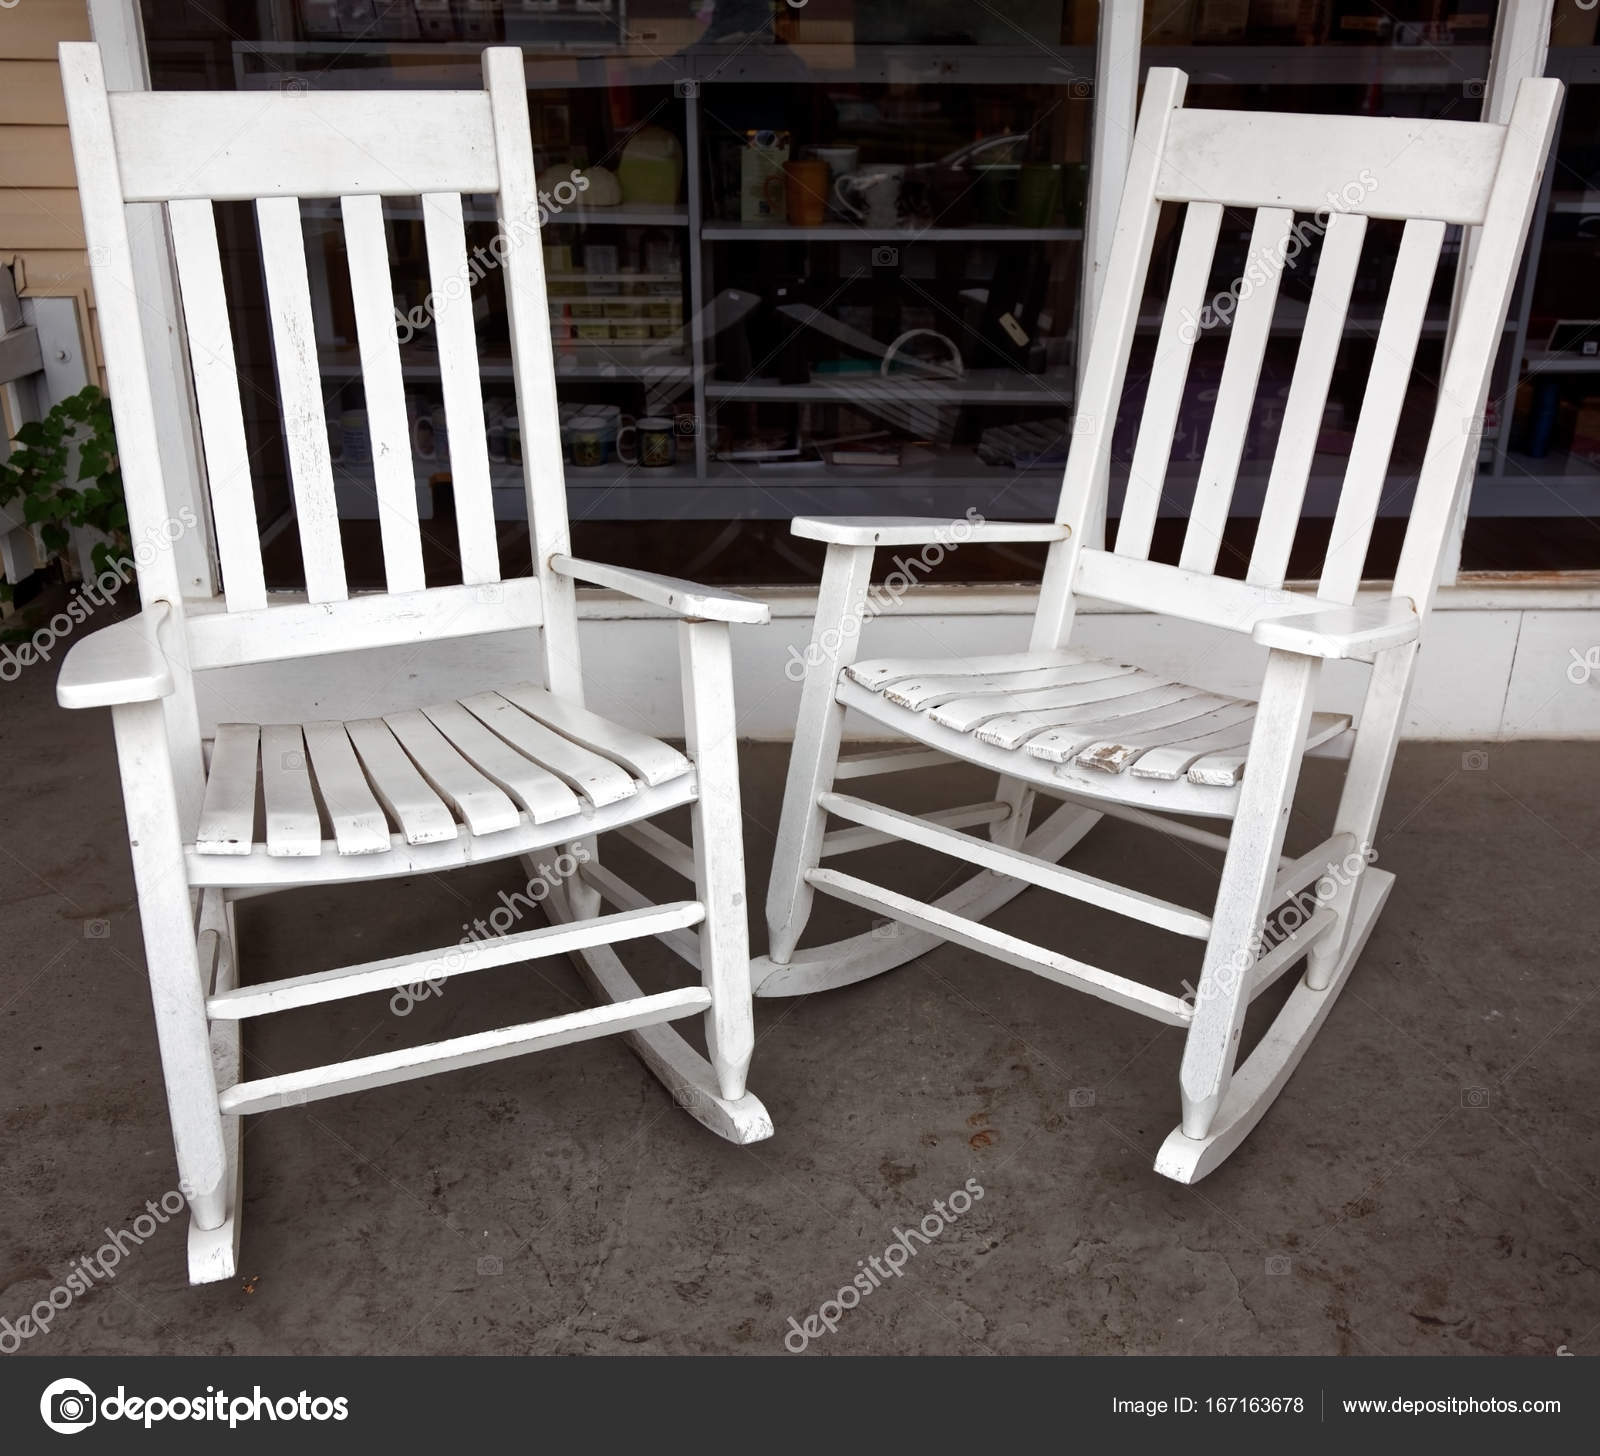 Surprising Porch Rocking Chairs Stock Photo C Errantpixels 167163678 Creativecarmelina Interior Chair Design Creativecarmelinacom